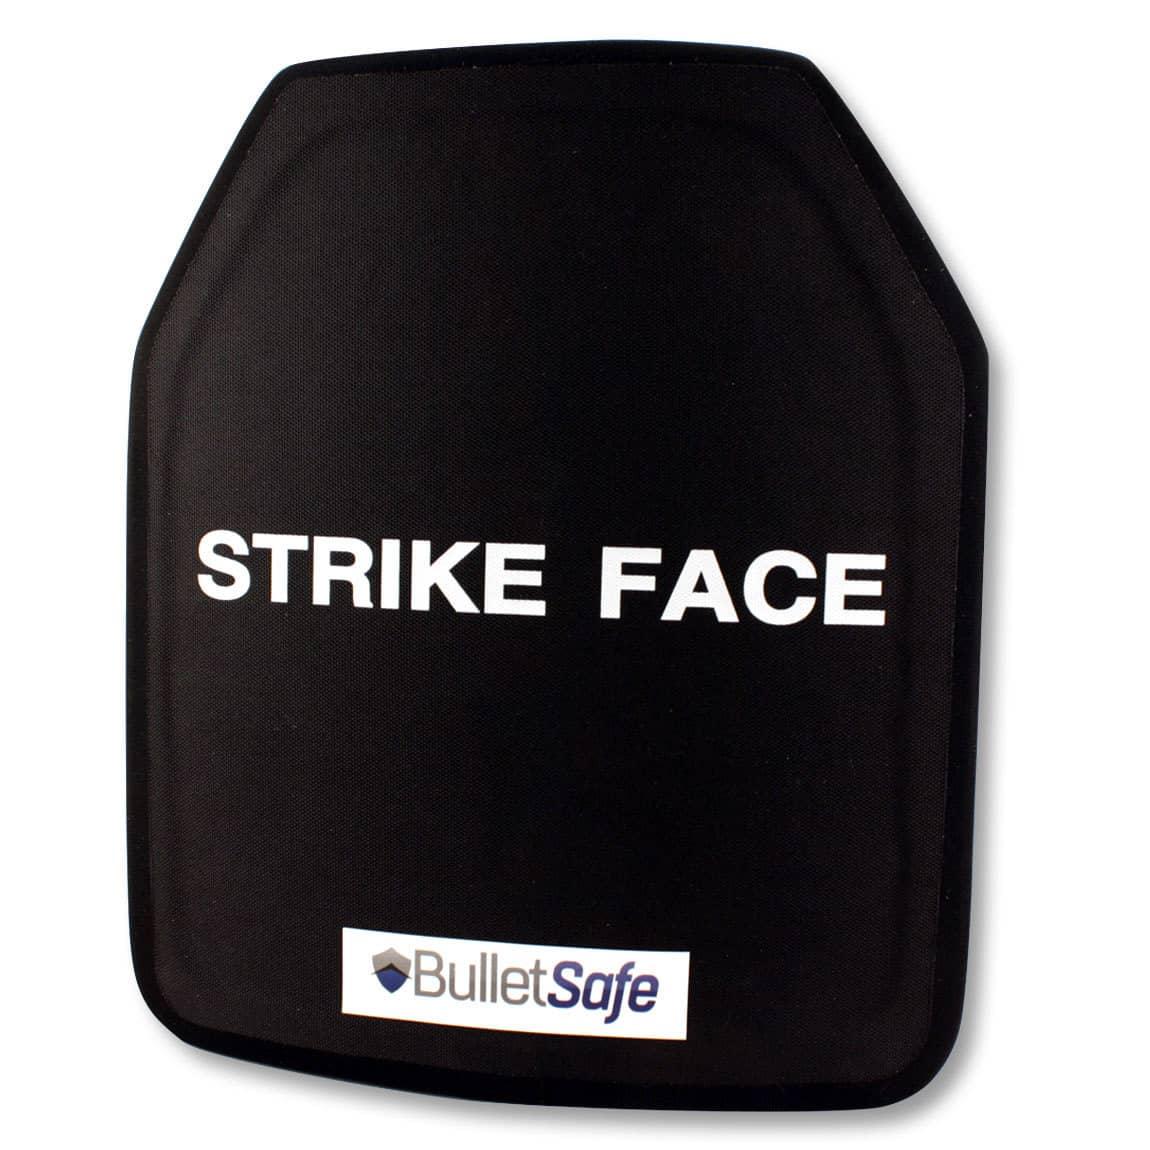 strike-face-level-iii-ballistic-plate.jpg